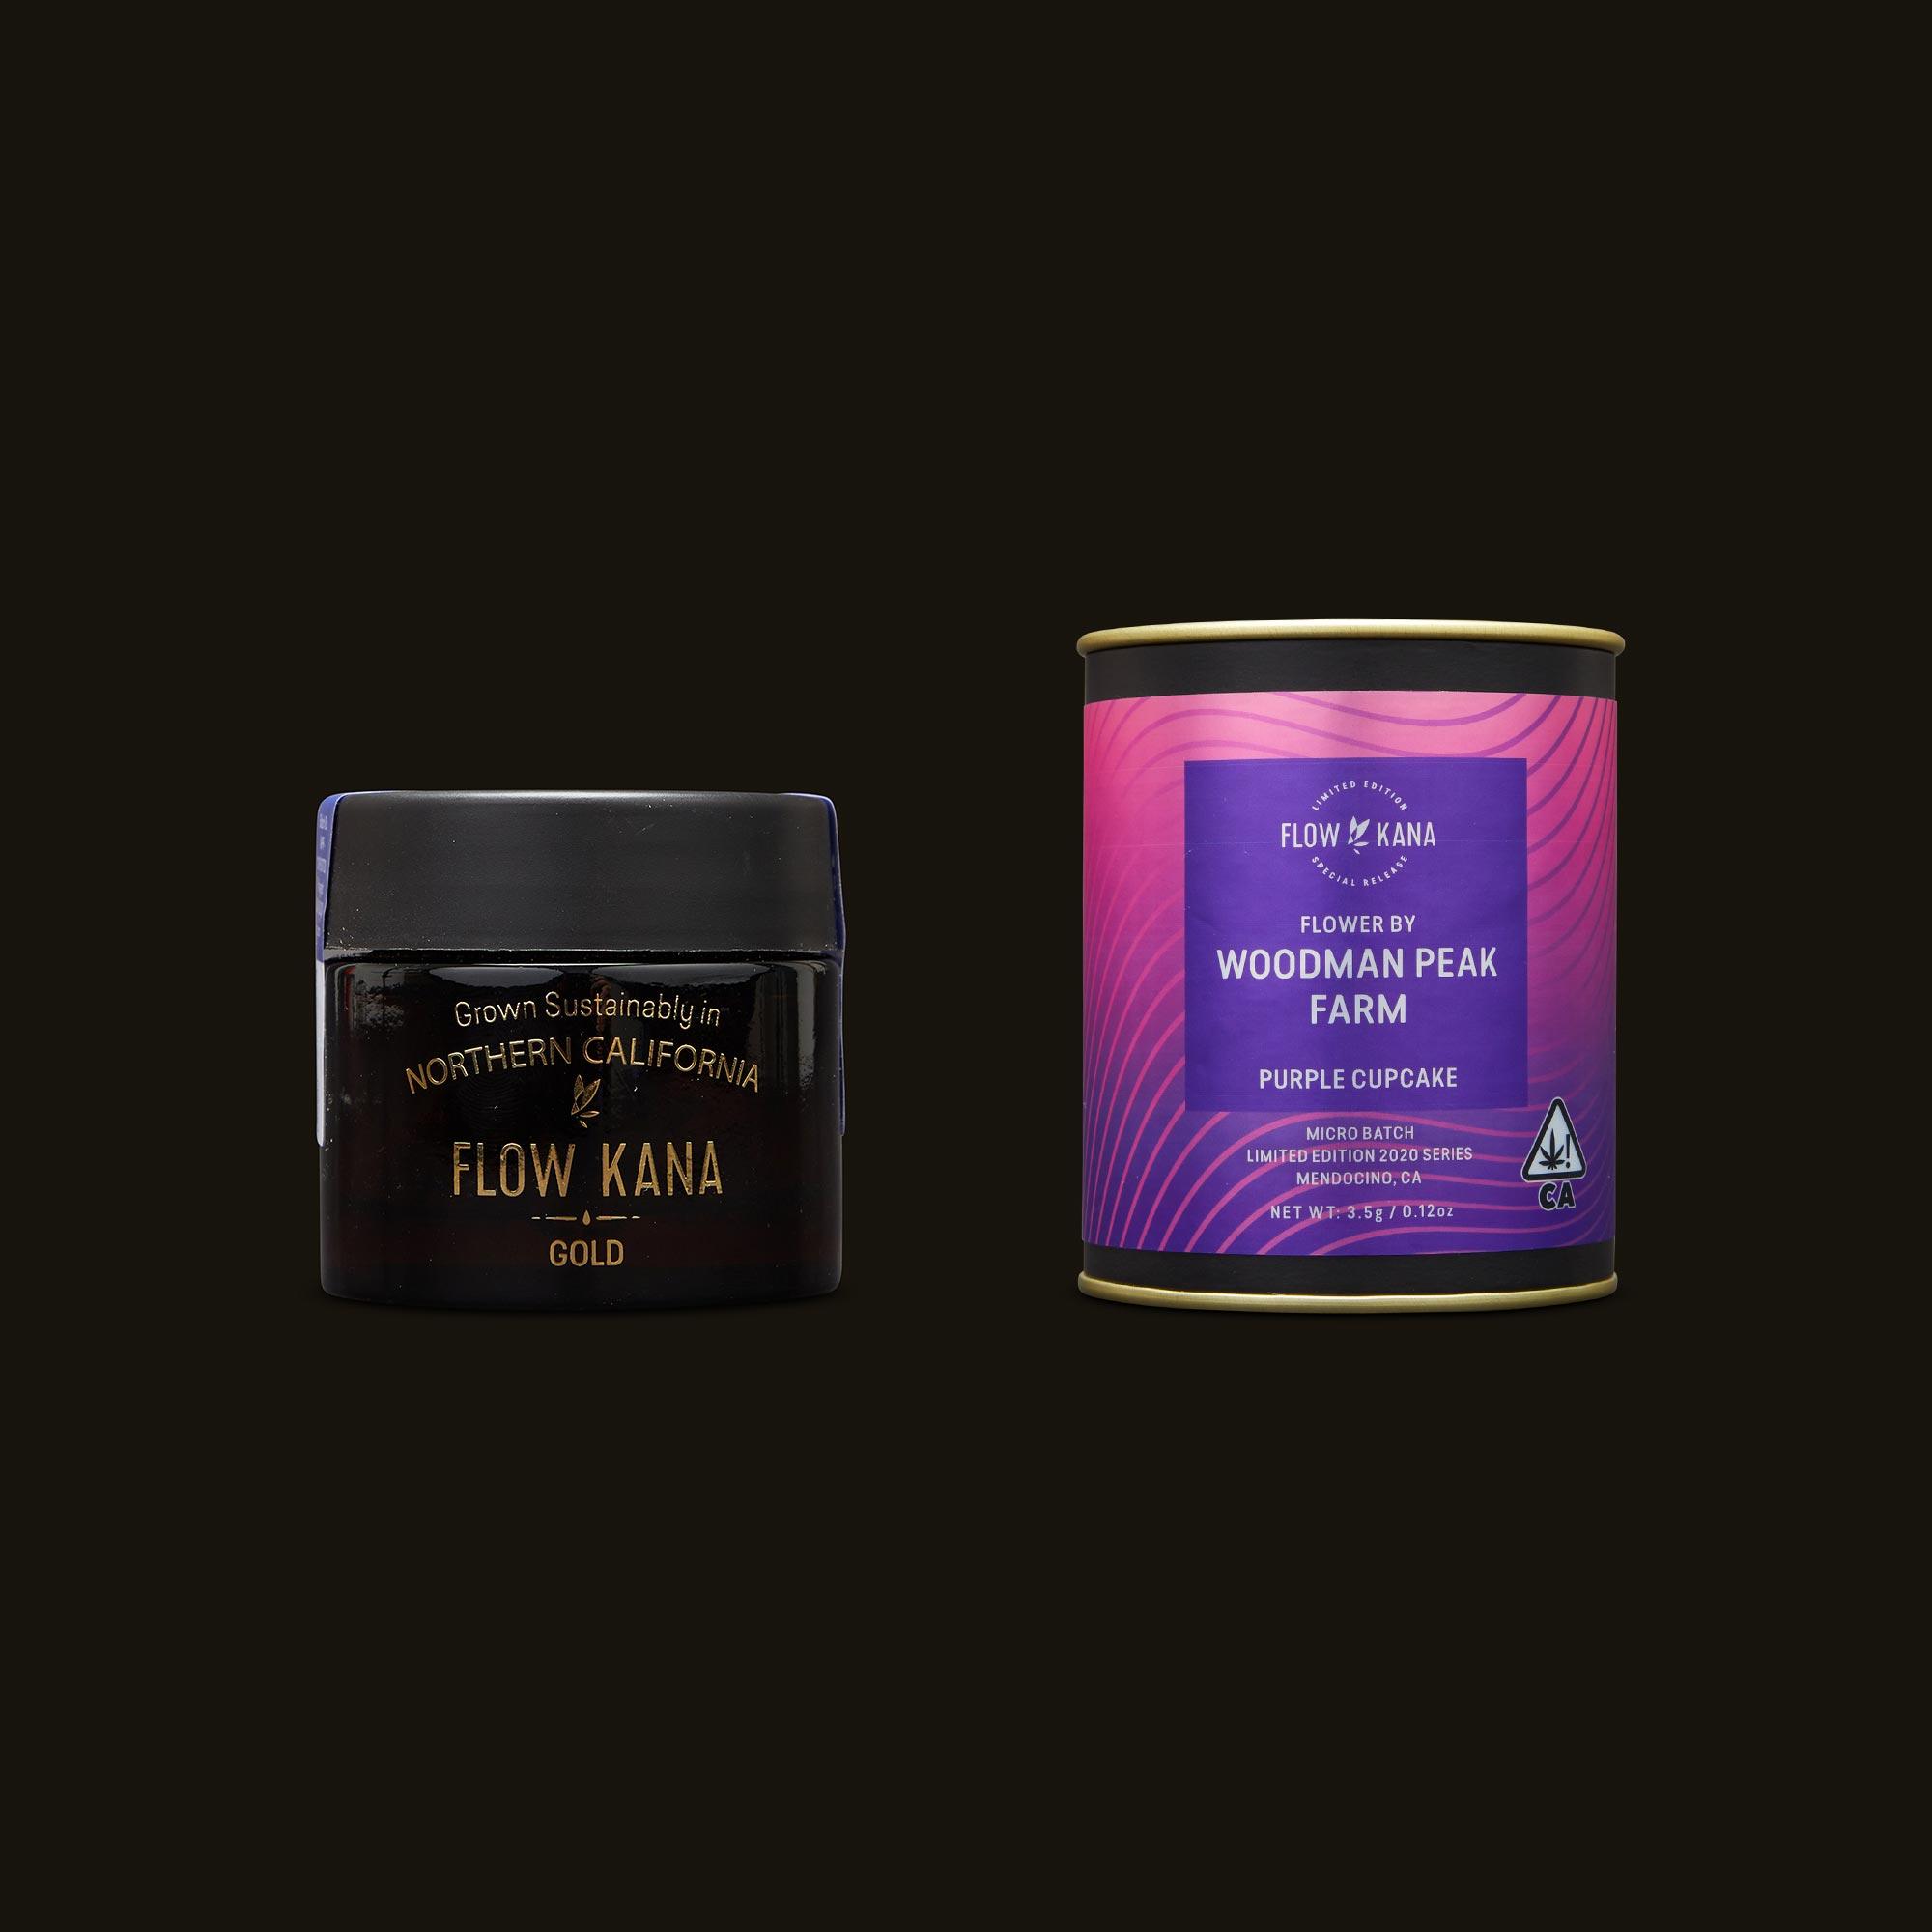 Flow Kana Purple Cupcake Jar and Packaging